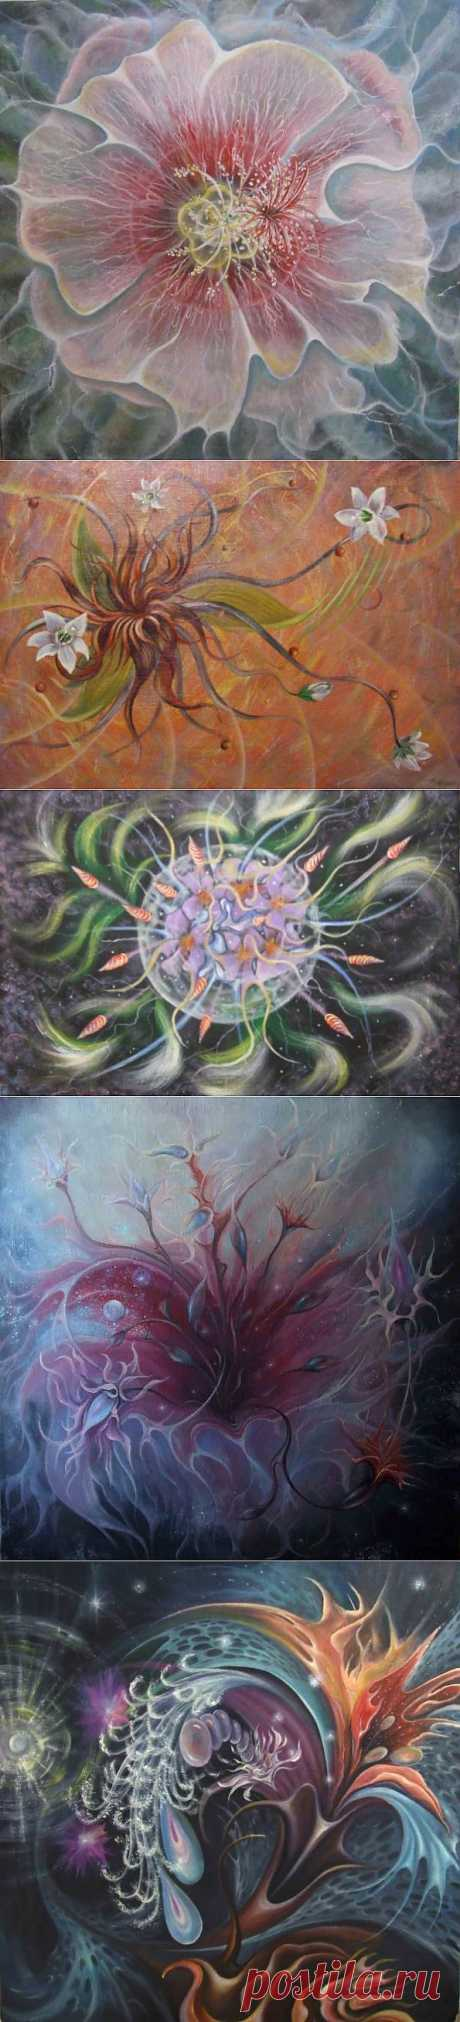 Вселенские цветы от художника Юрия Латухина.